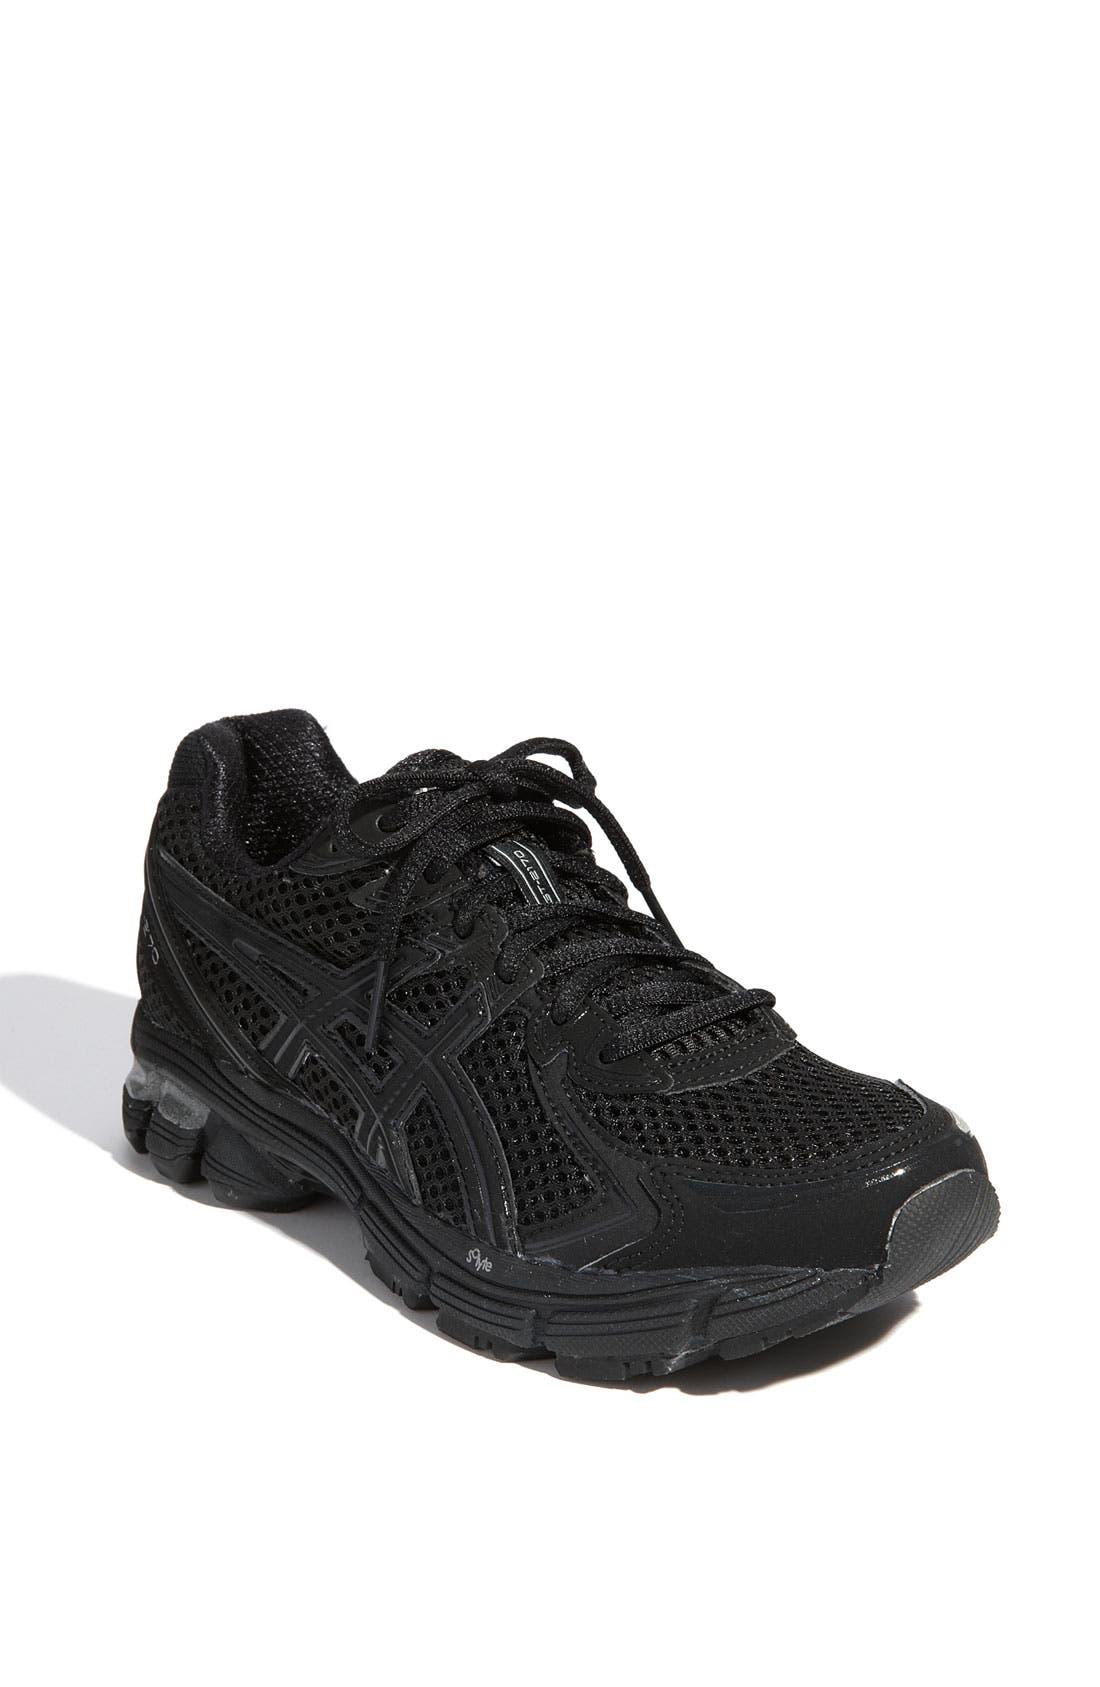 Main Image - ASICS® 'GT 2170' Running Shoe (Women)